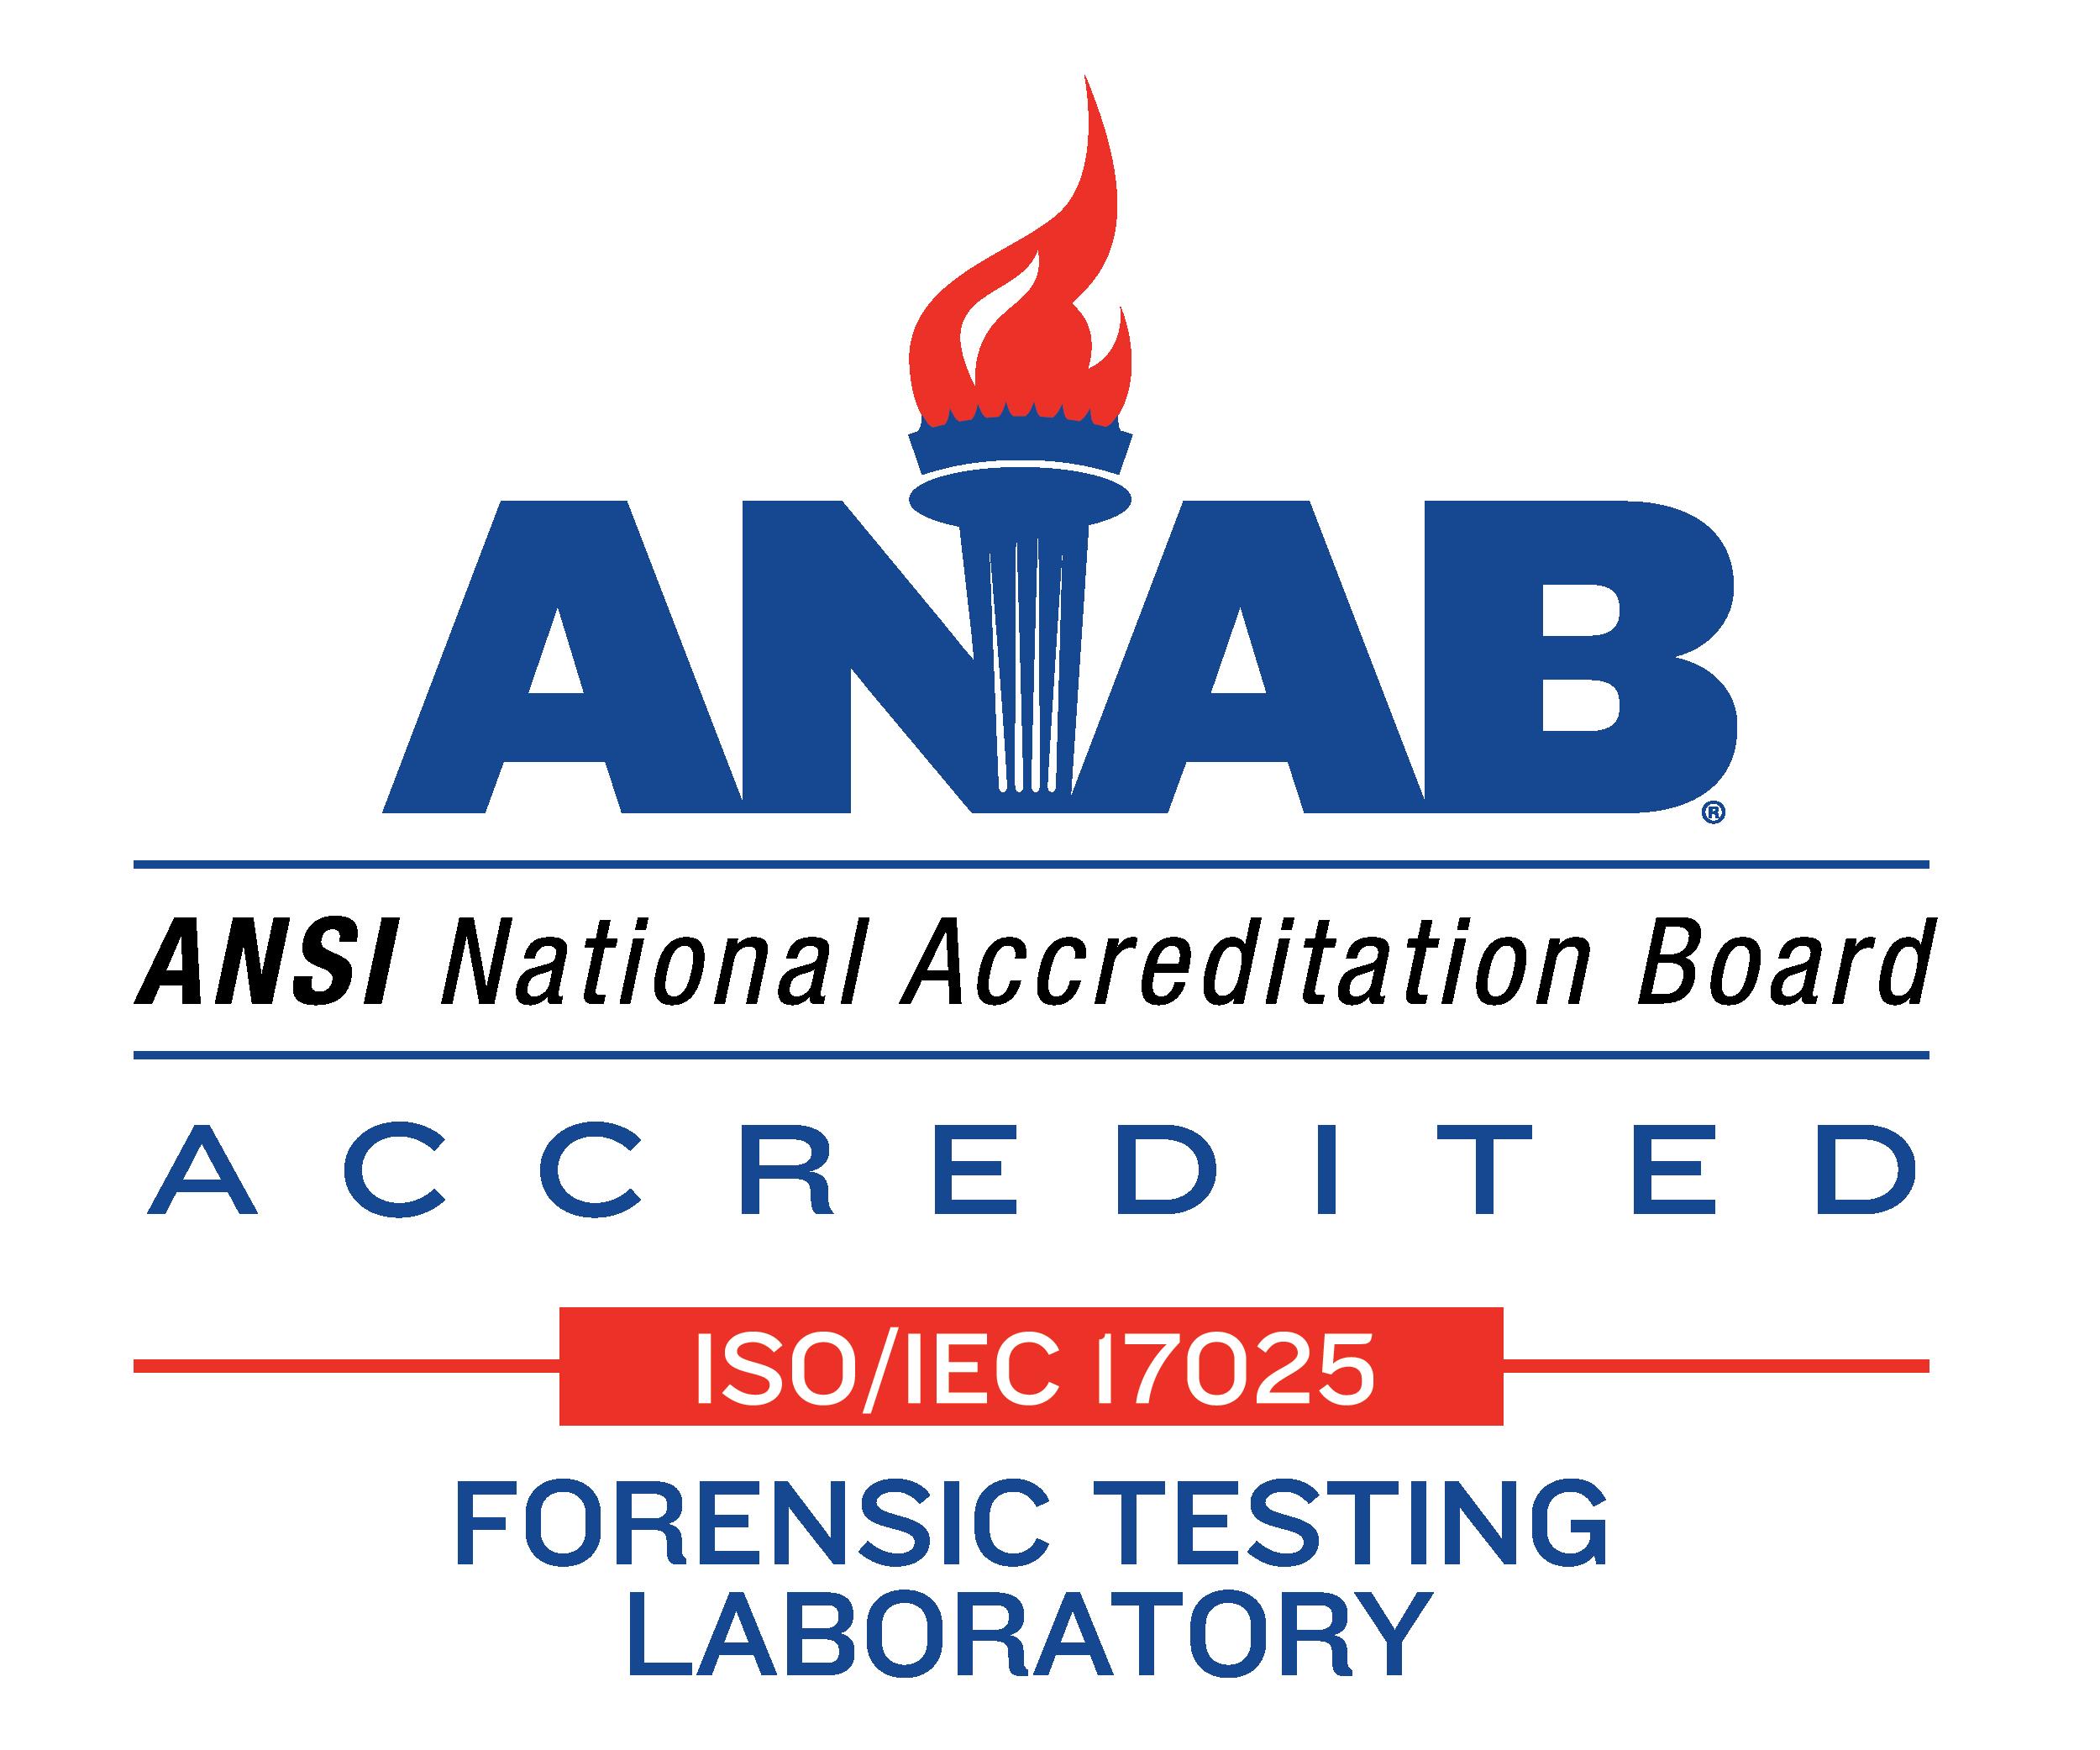 ANAB Accreditation